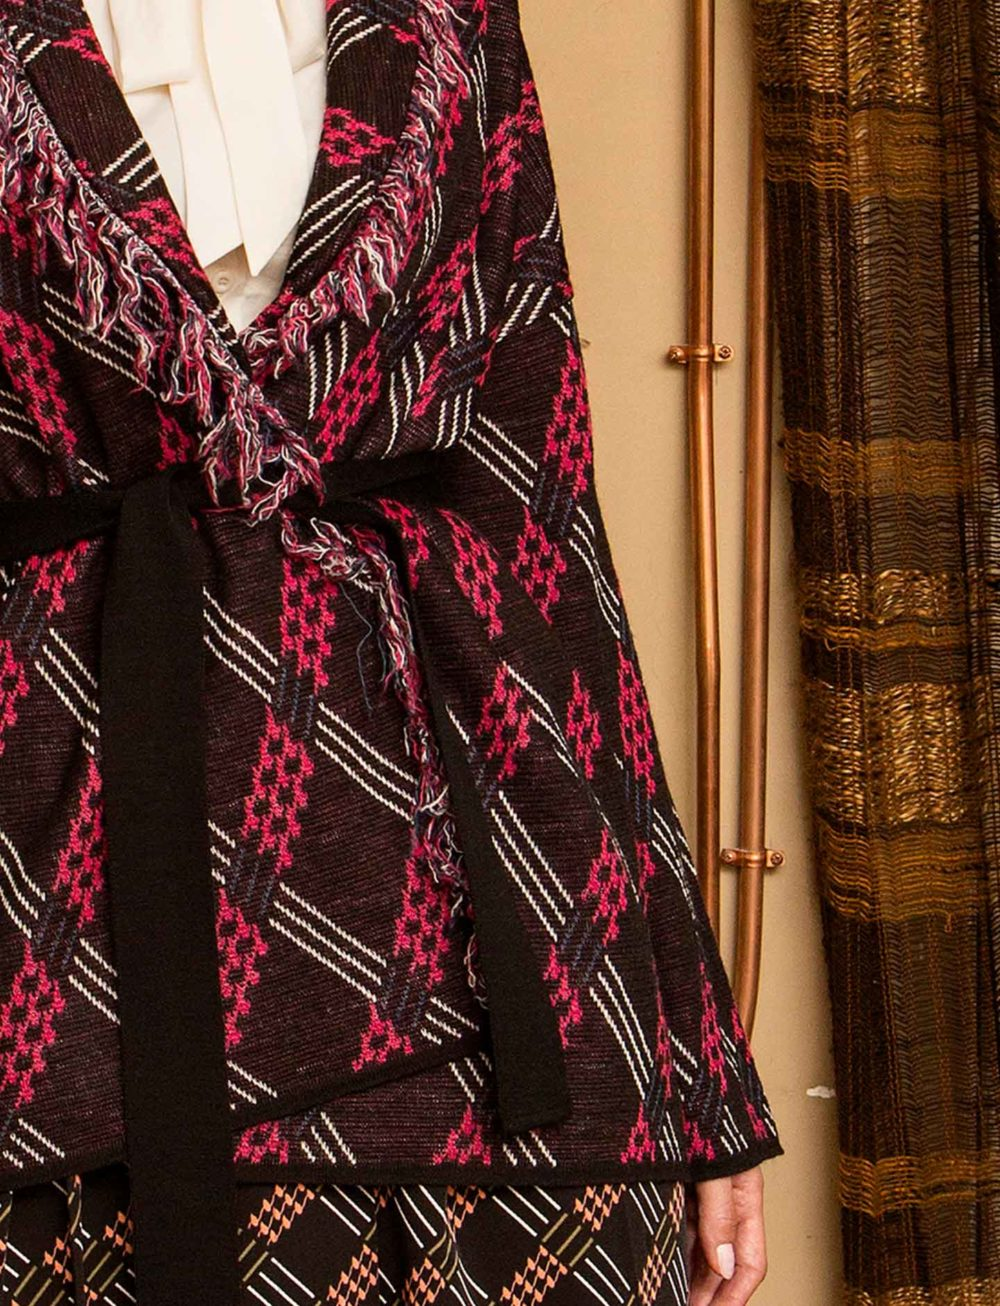 chaqueta-estampado-cinturon-detalle